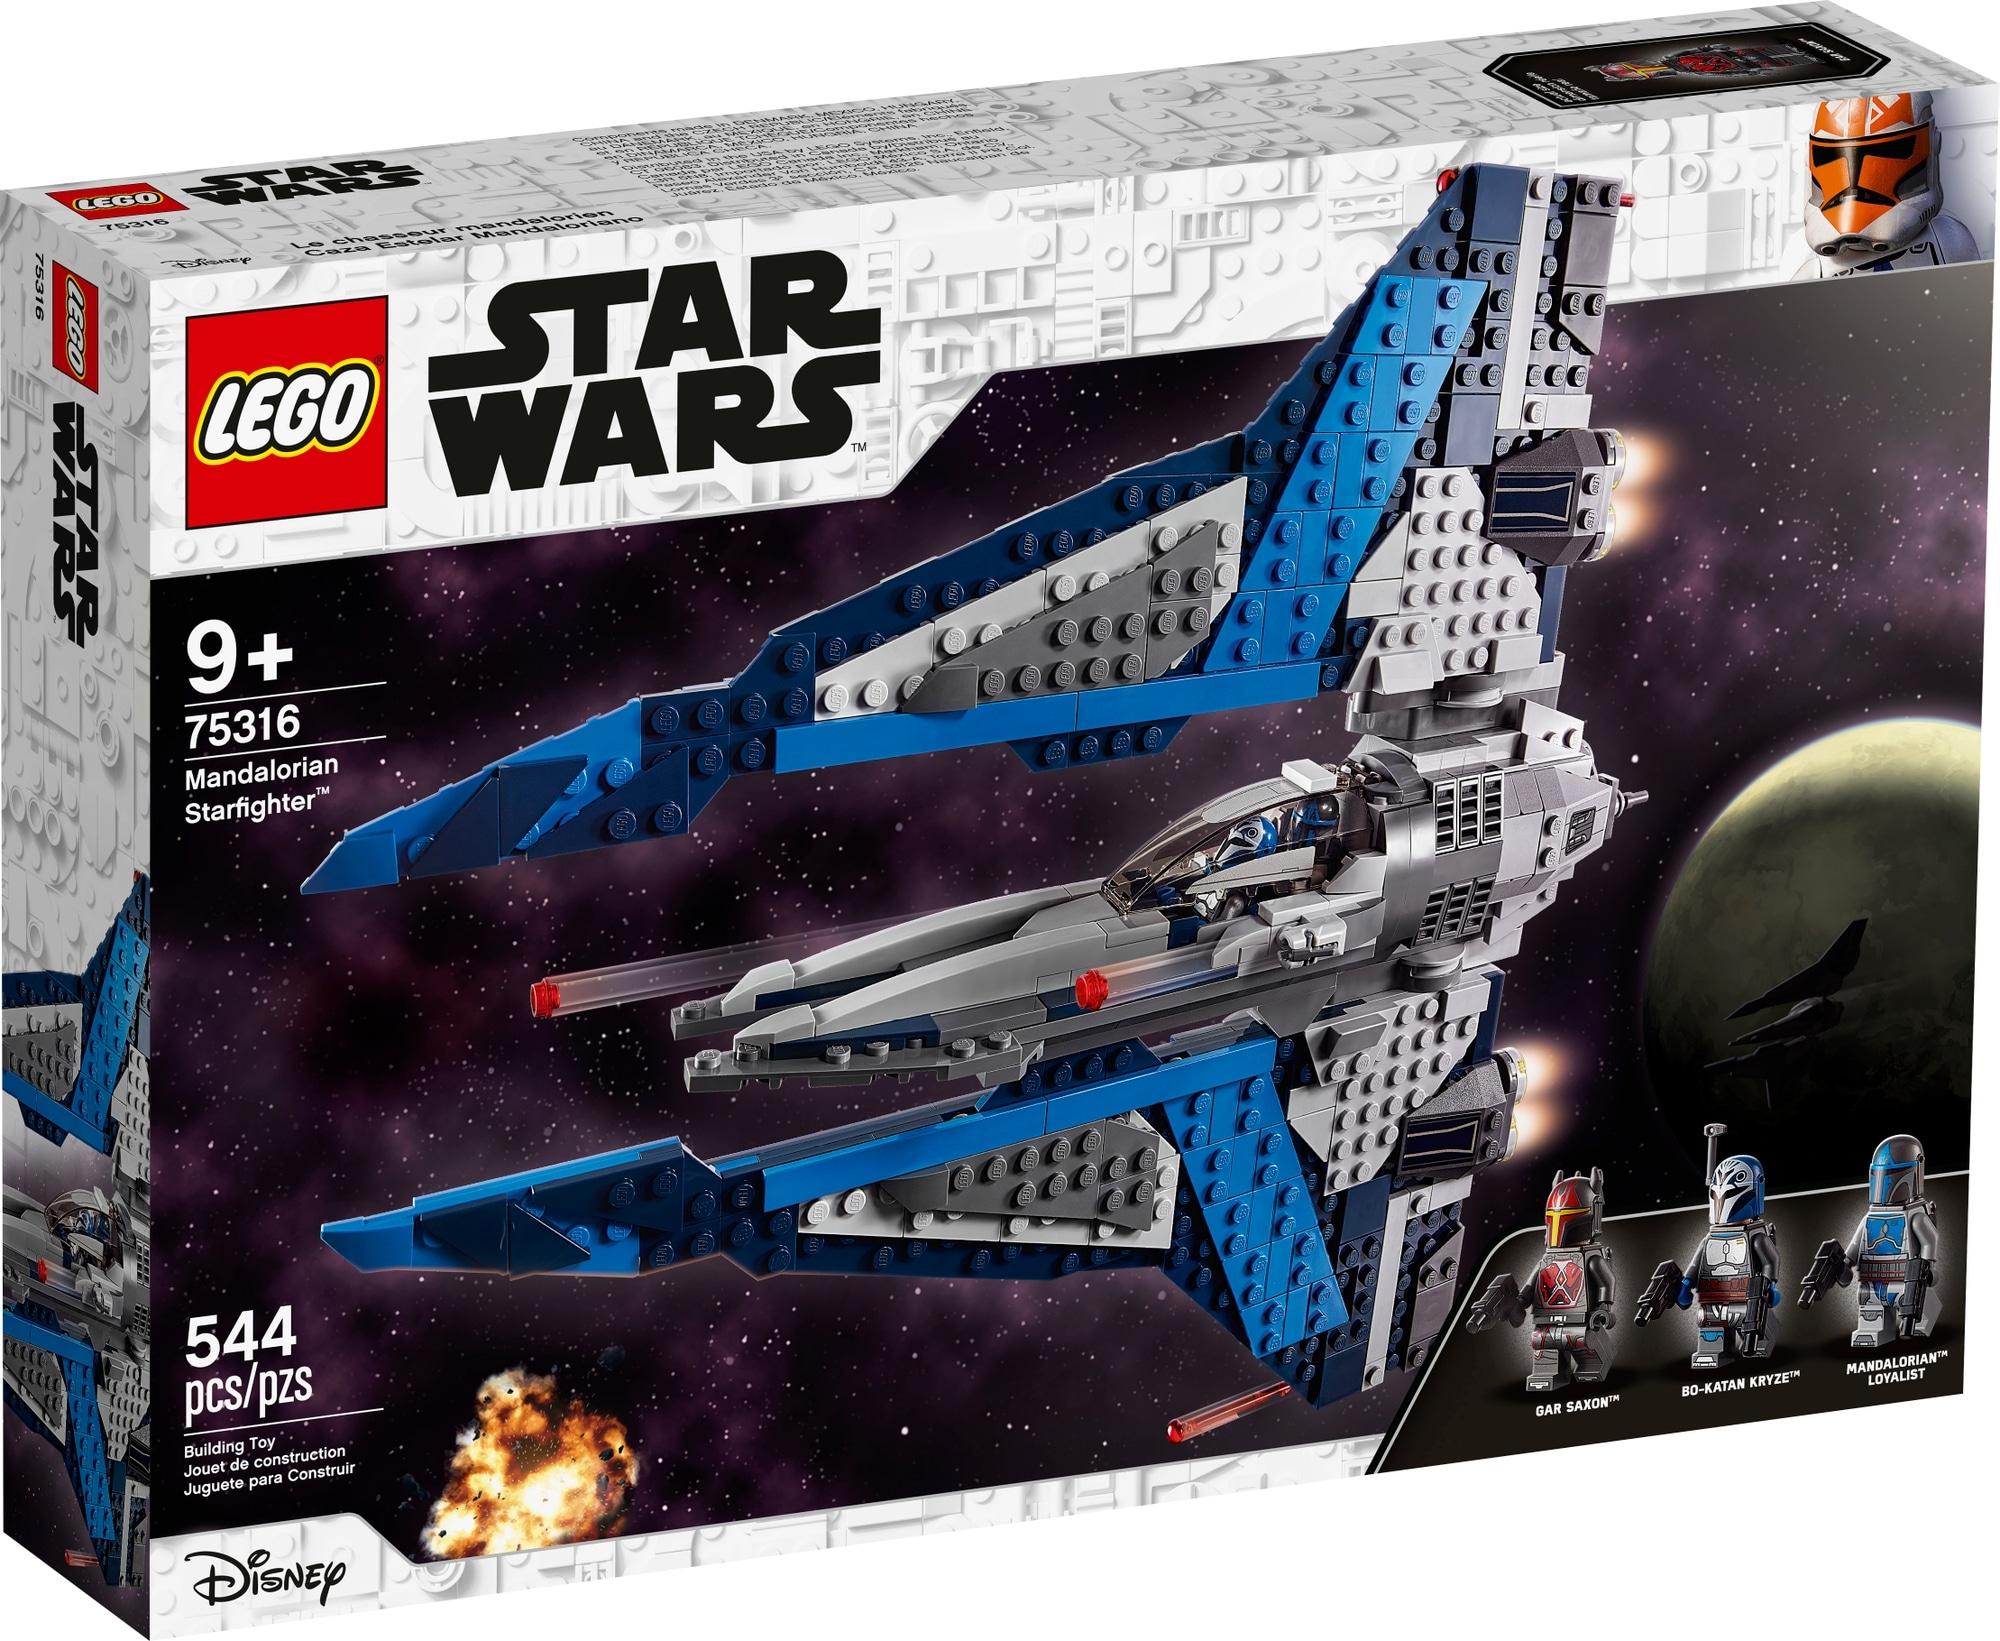 LEGO Star Wars 75316 Mandalorian Starfighter 2